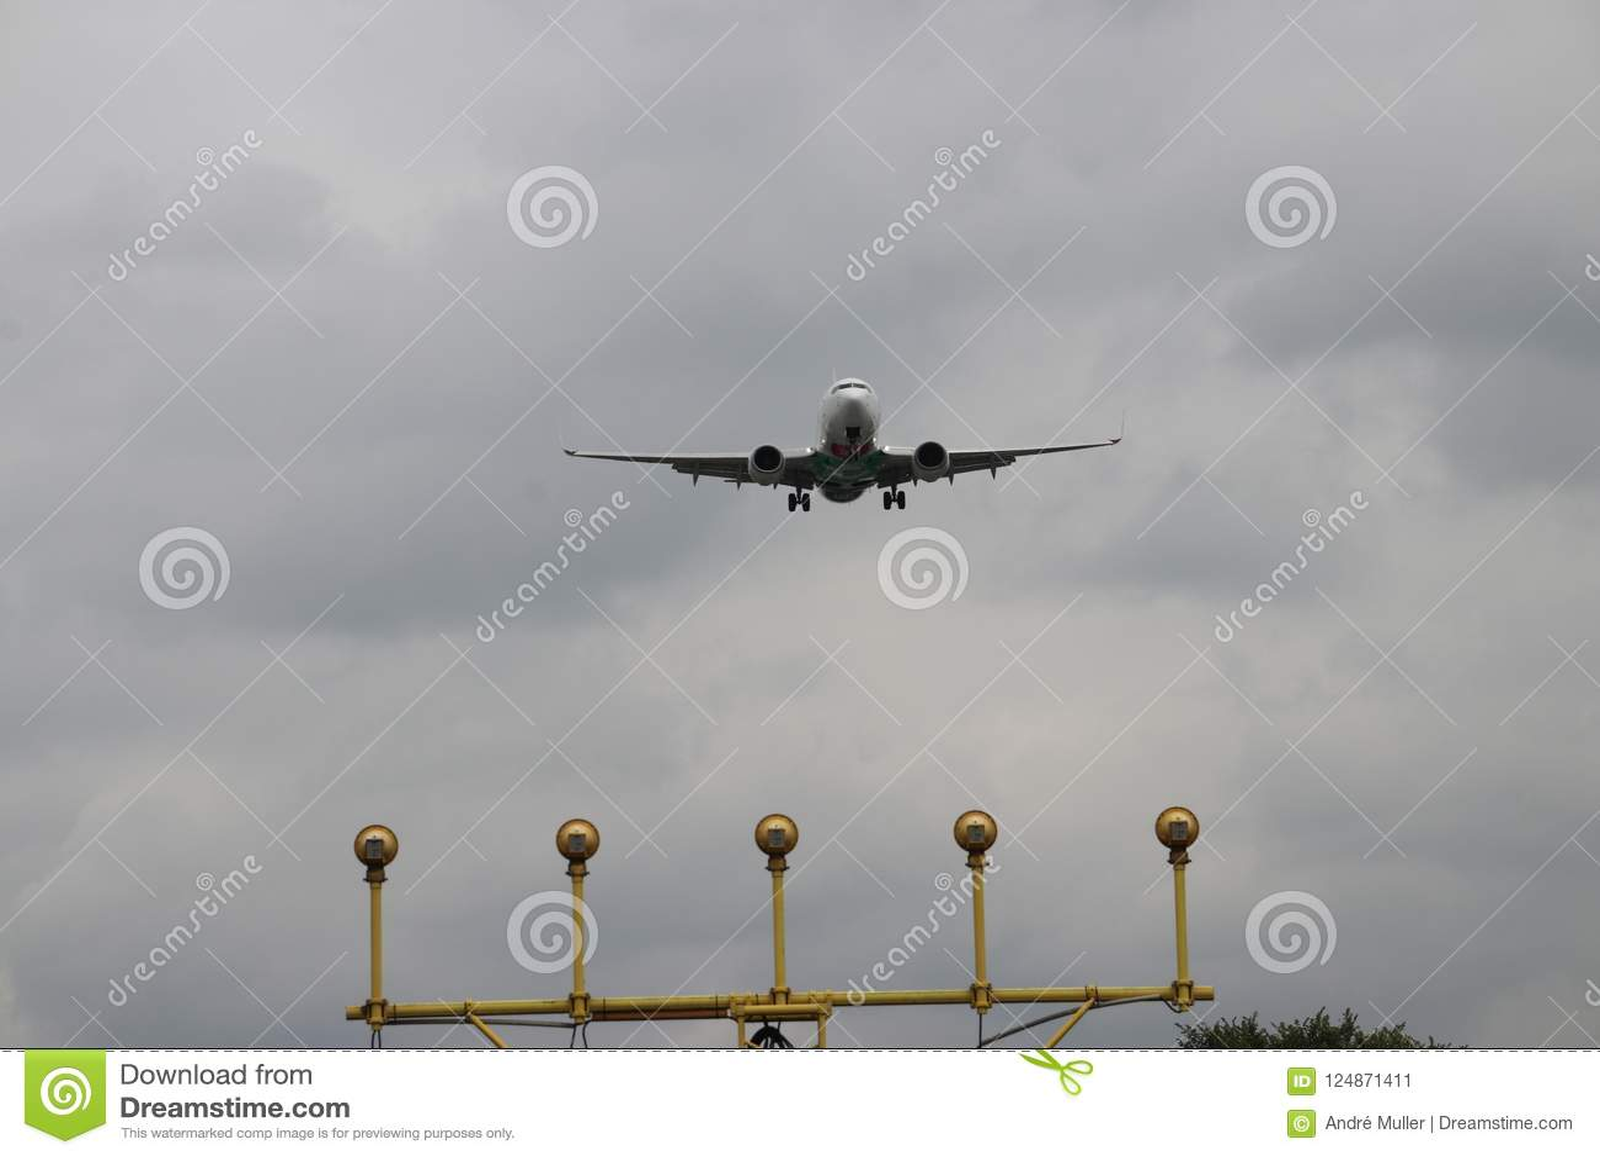 Aircraft Is Approachibg The Landing Strip Above The Landing Lights